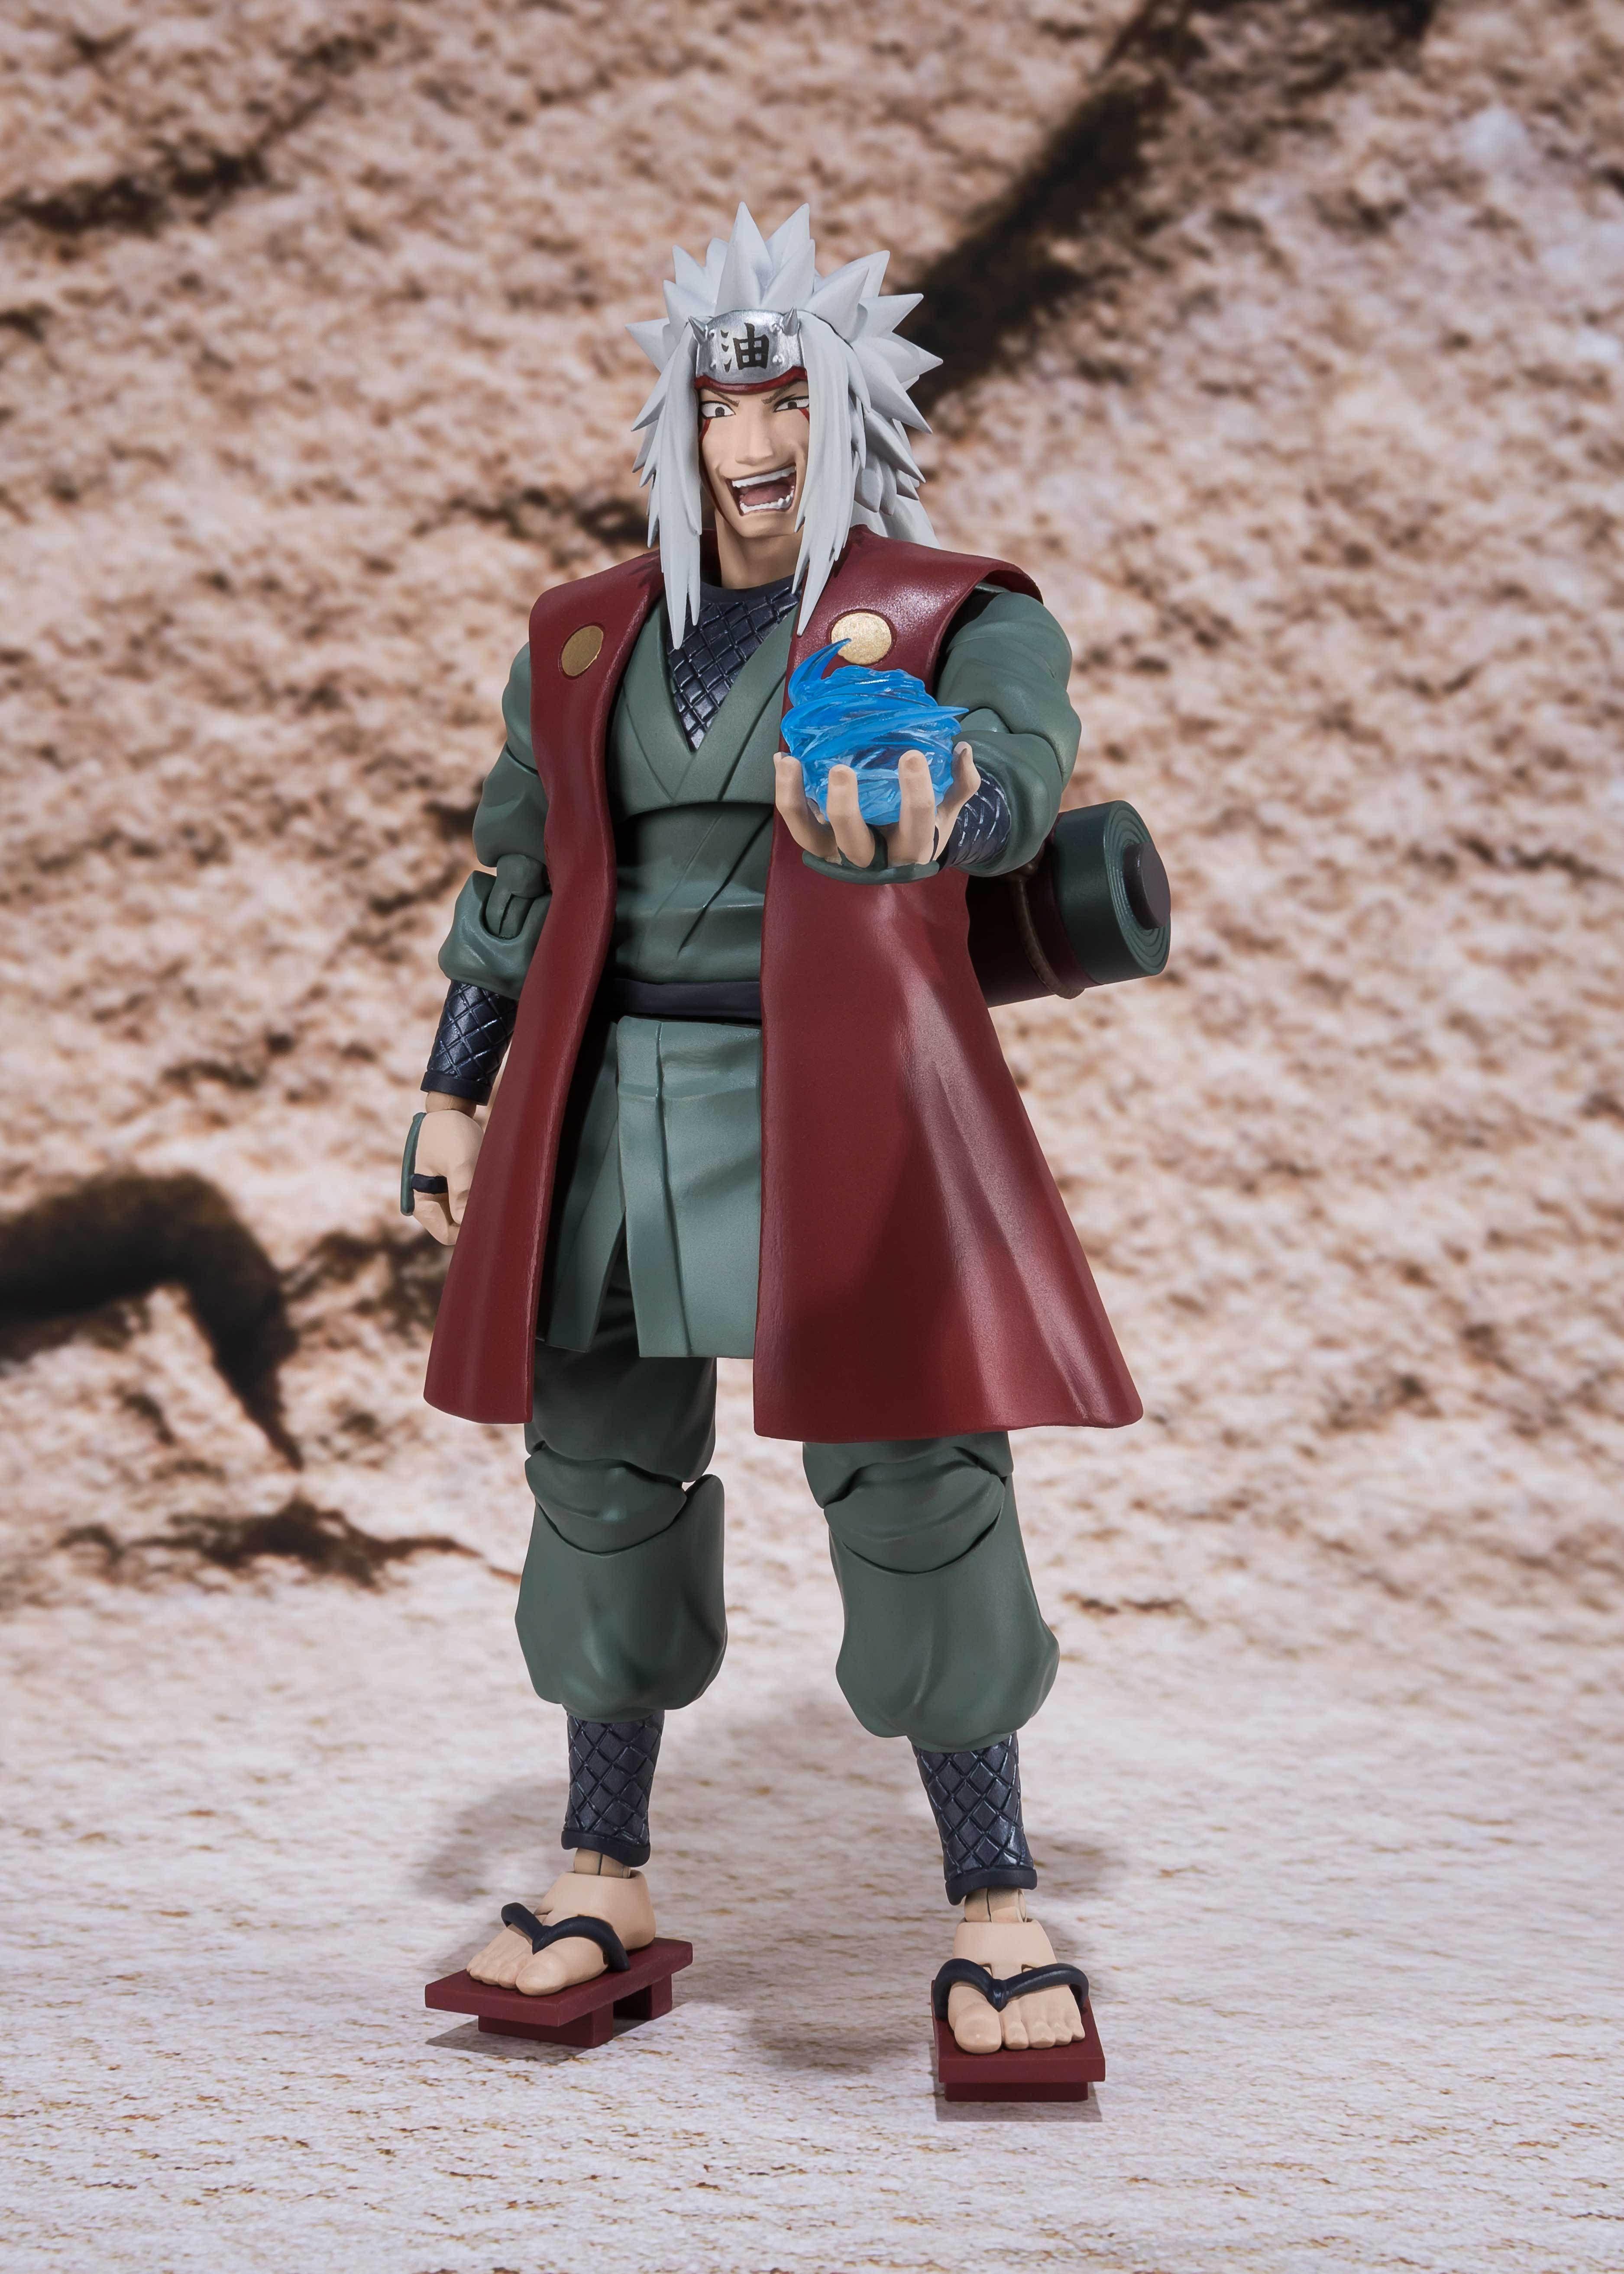 S H Figuarts NARUTO Shippuden Madara Uchiha Action Figure Toy Gift New In Box